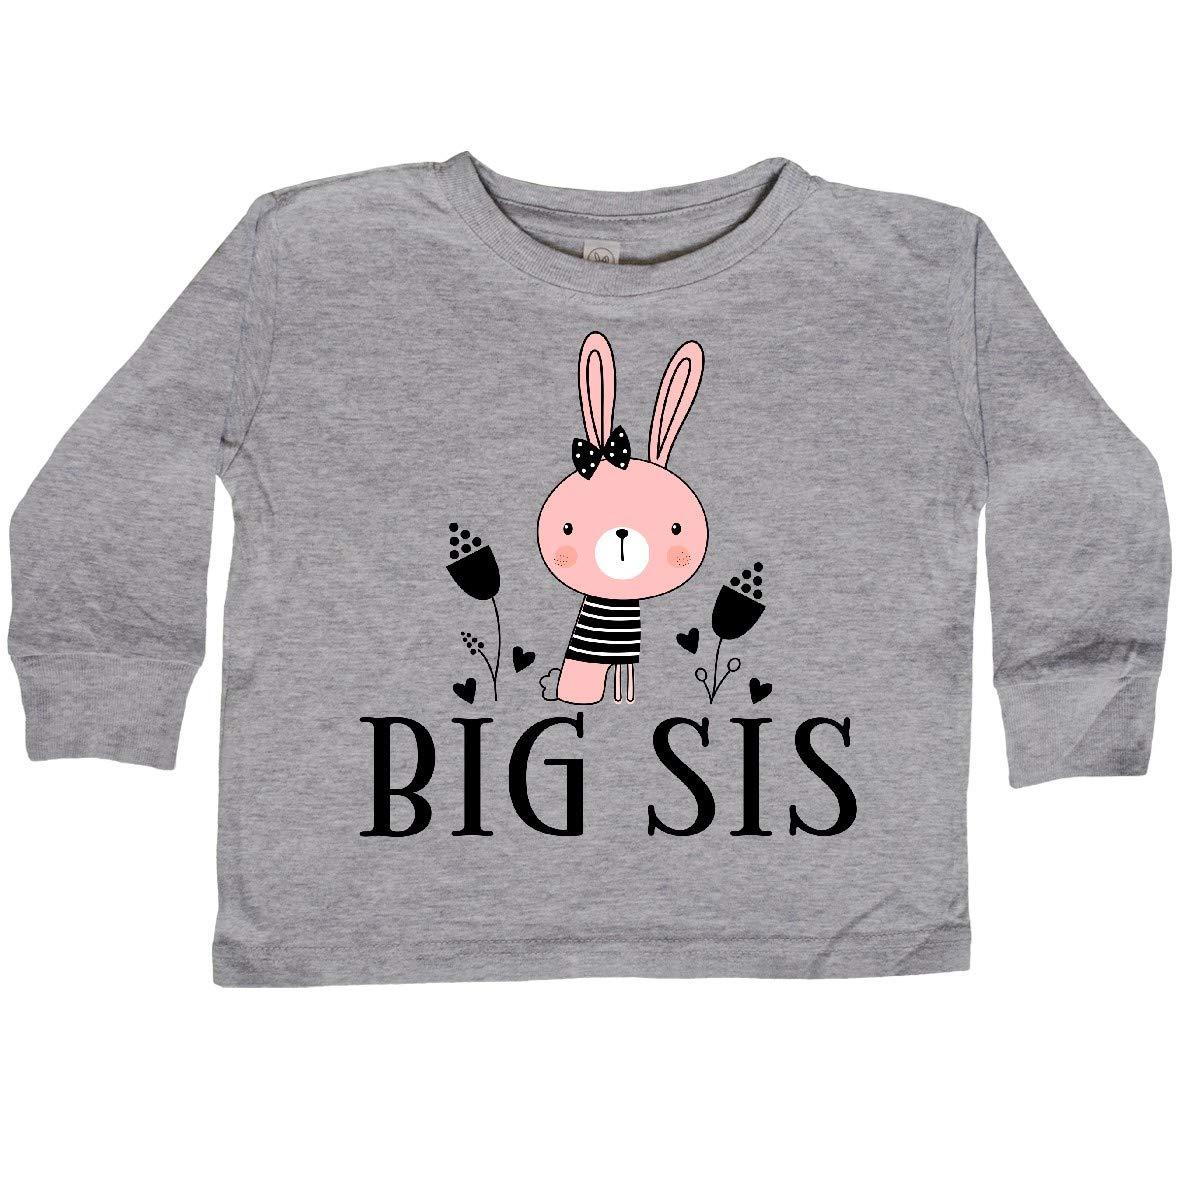 inktastic Big Sis Outfit Girls Sister Bunny Toddler Long Sleeve T-Shirt